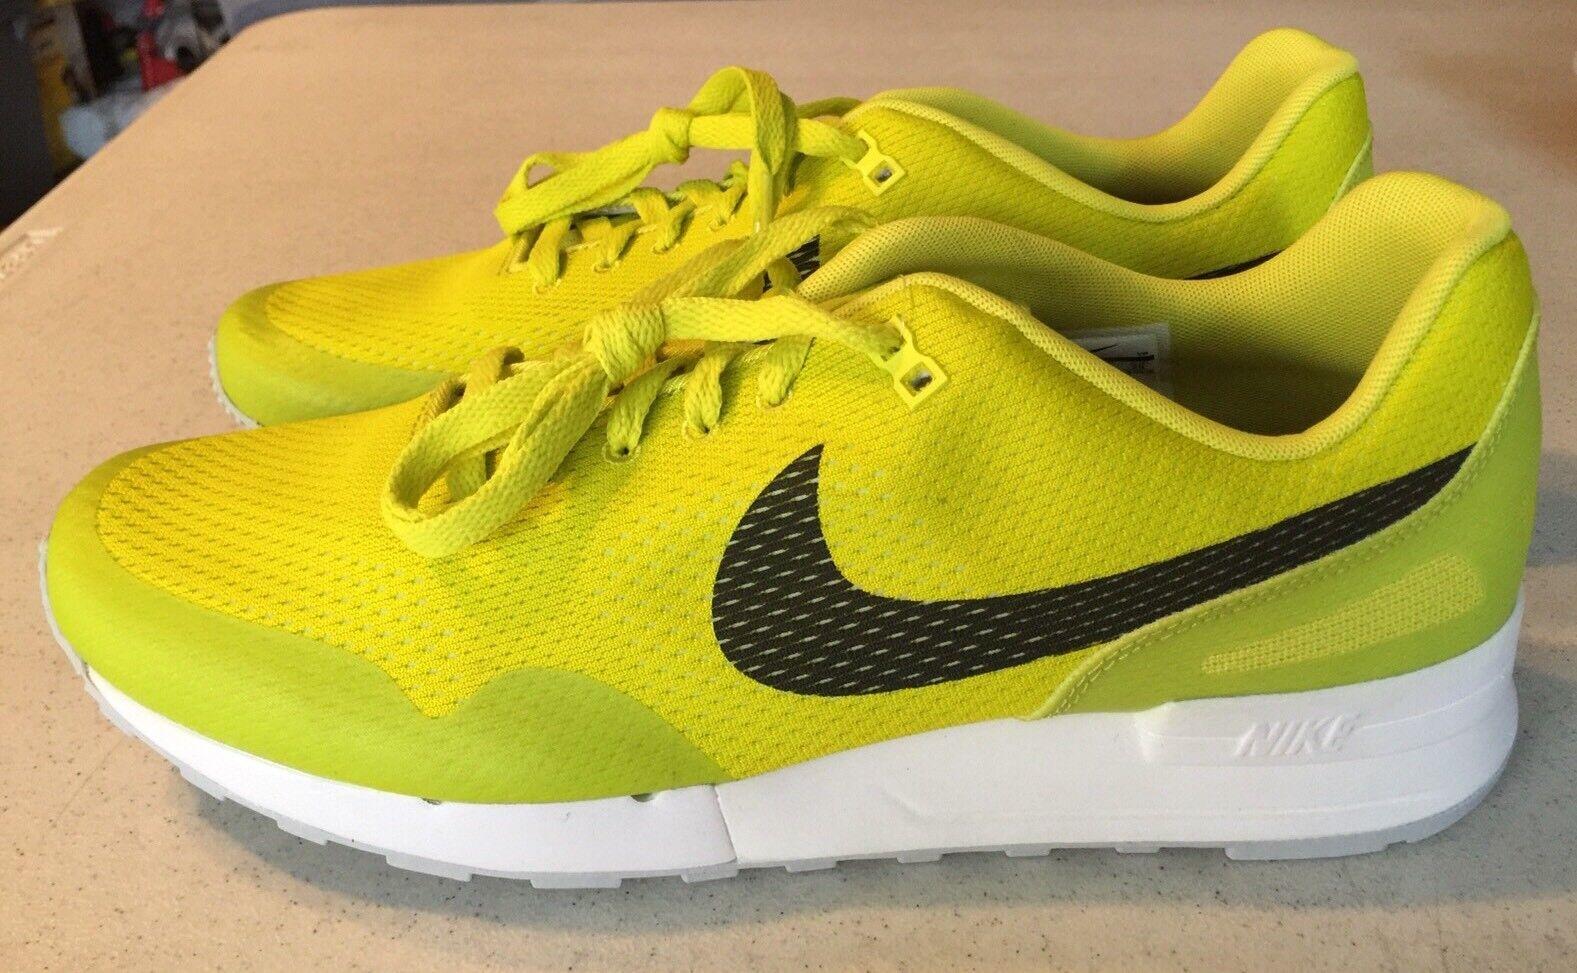 Nike Air Pegasus 89 EGD Running Shoes 876111-300 US 11